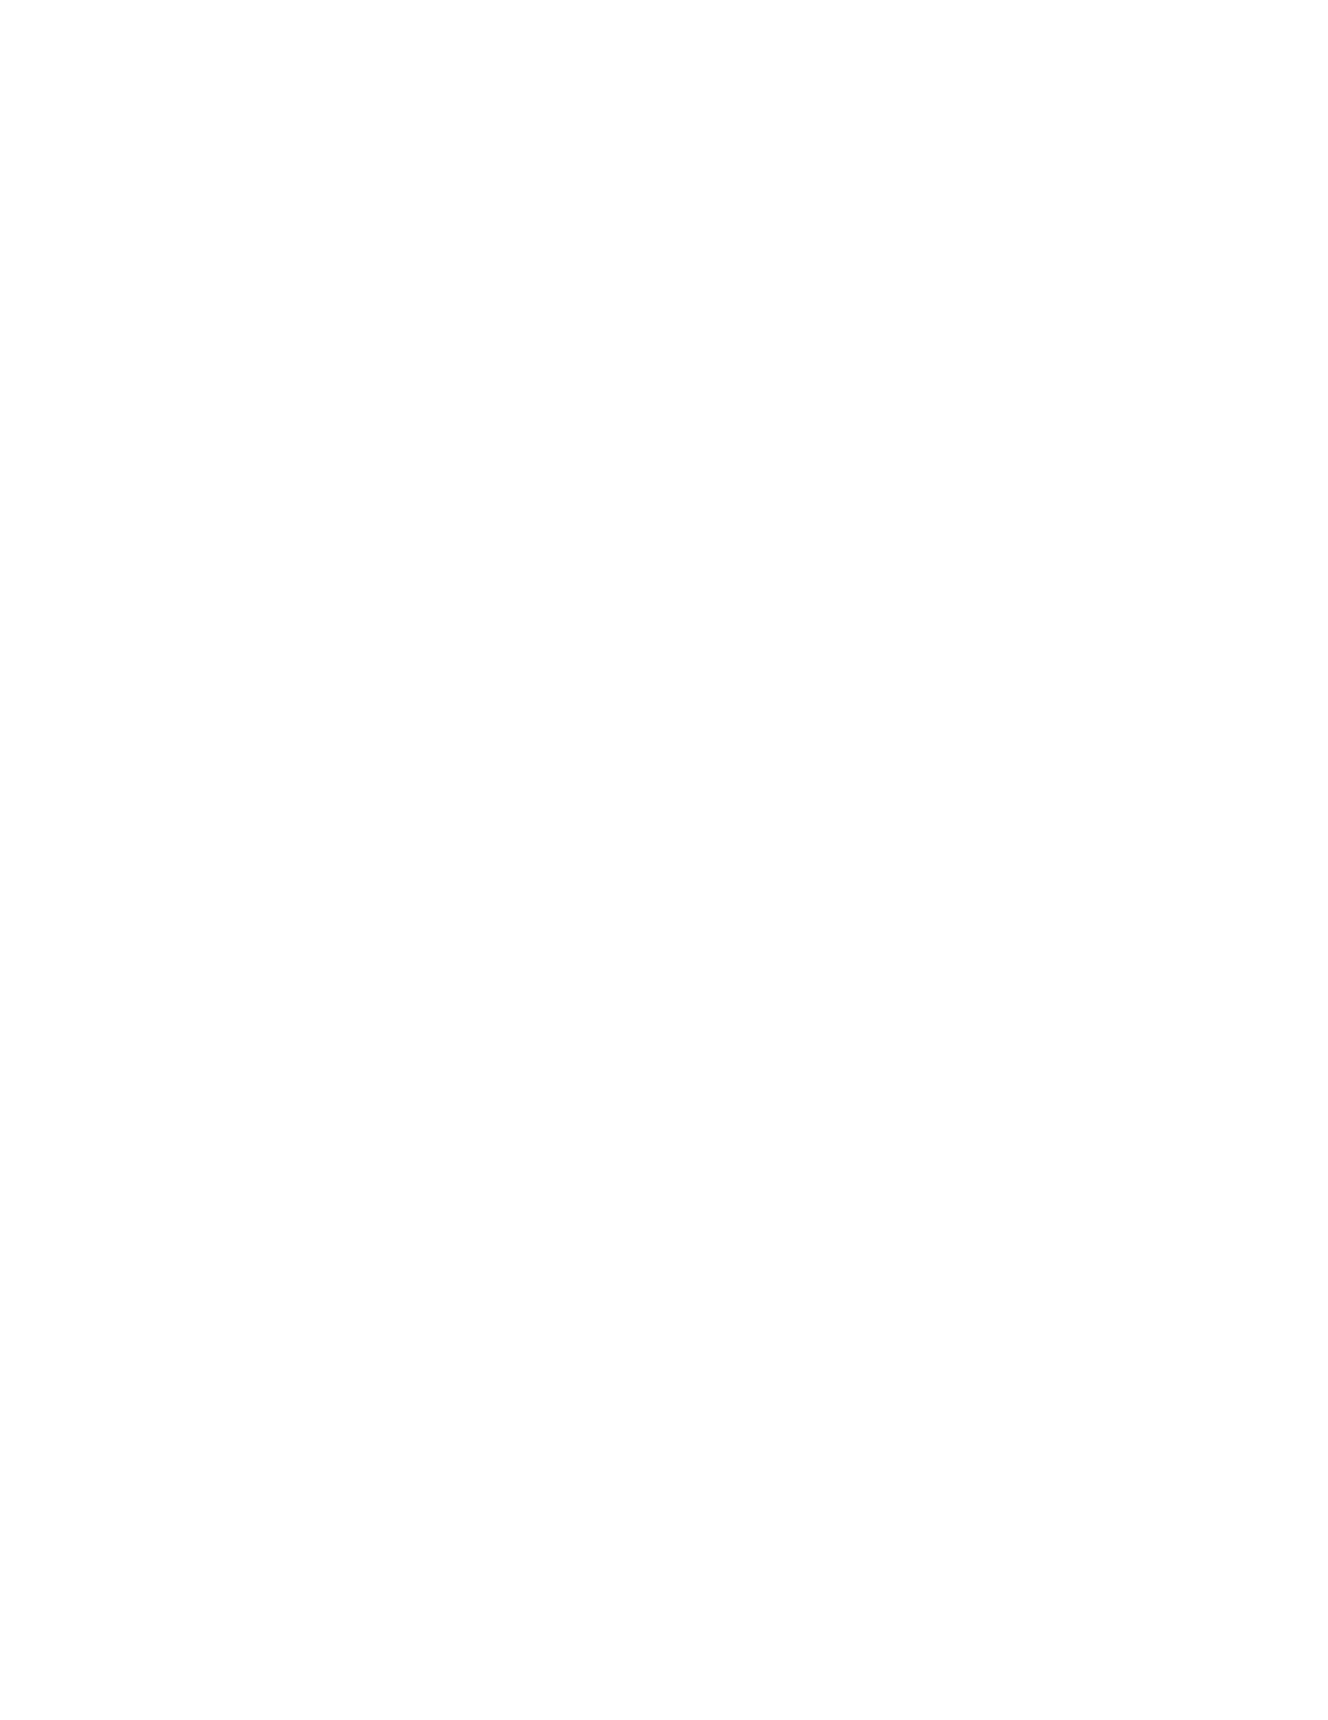 ManifestMedex-vertical-white-RGB